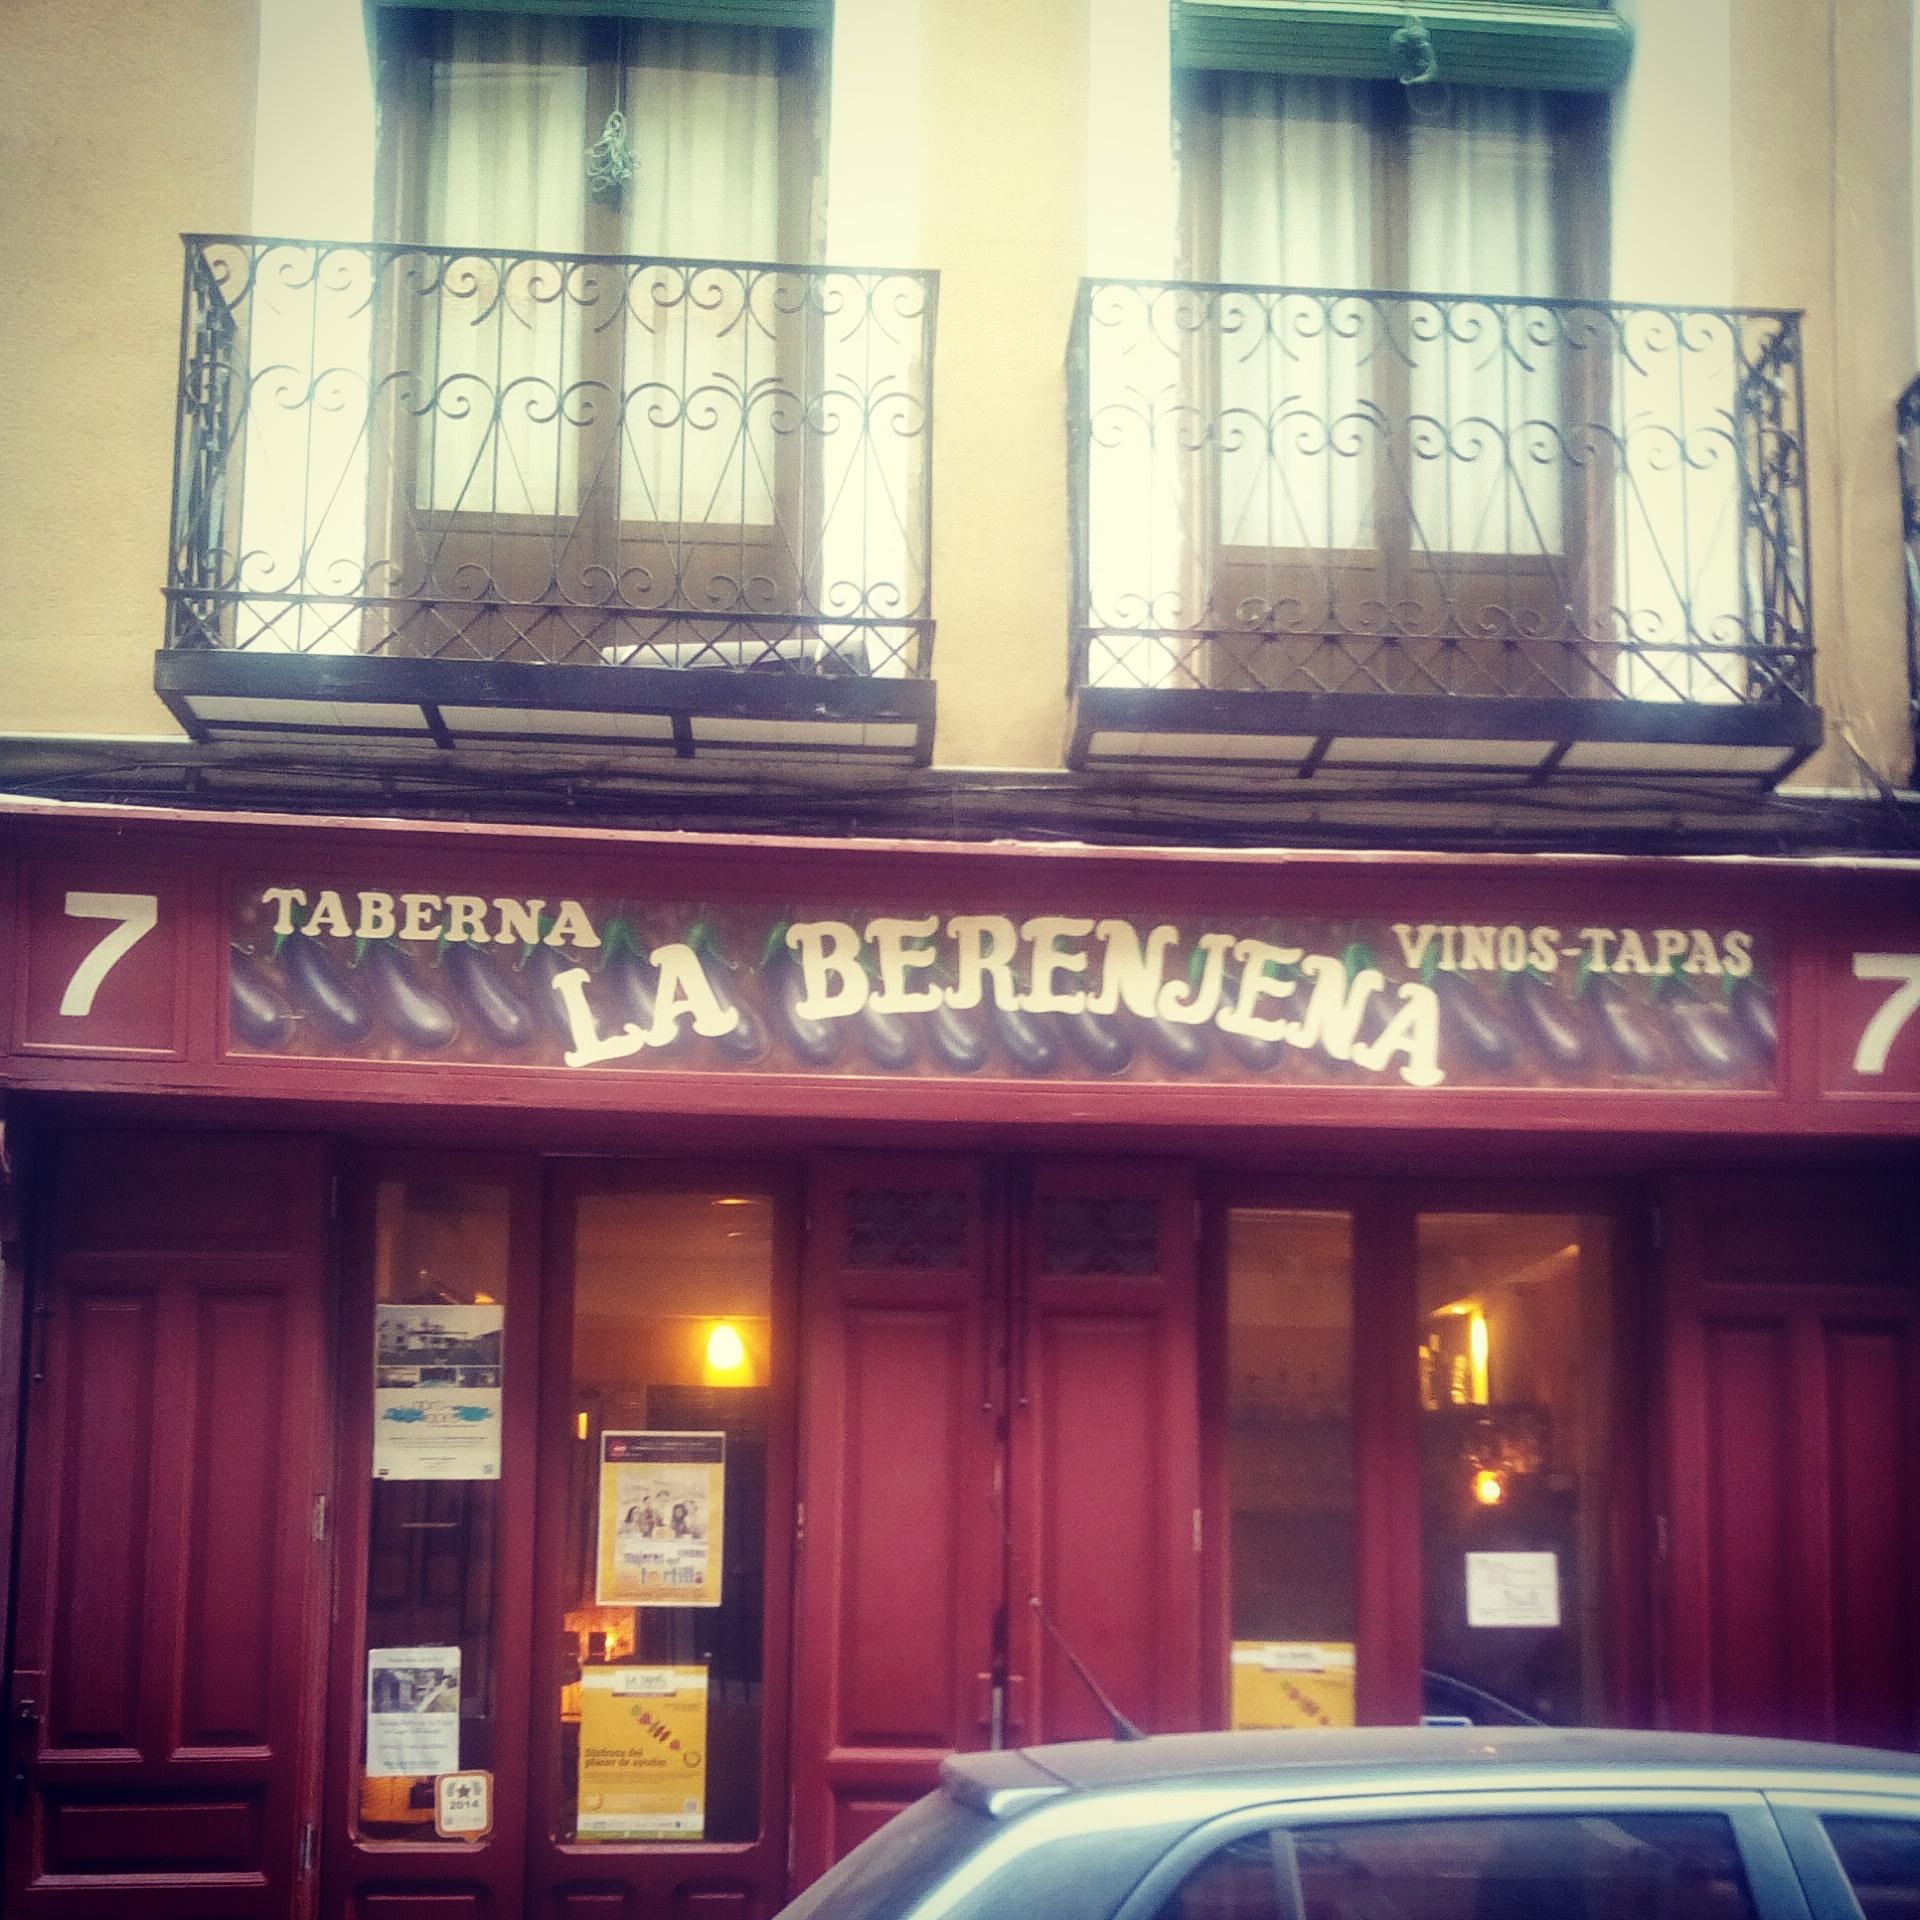 Taberna La Berenjena